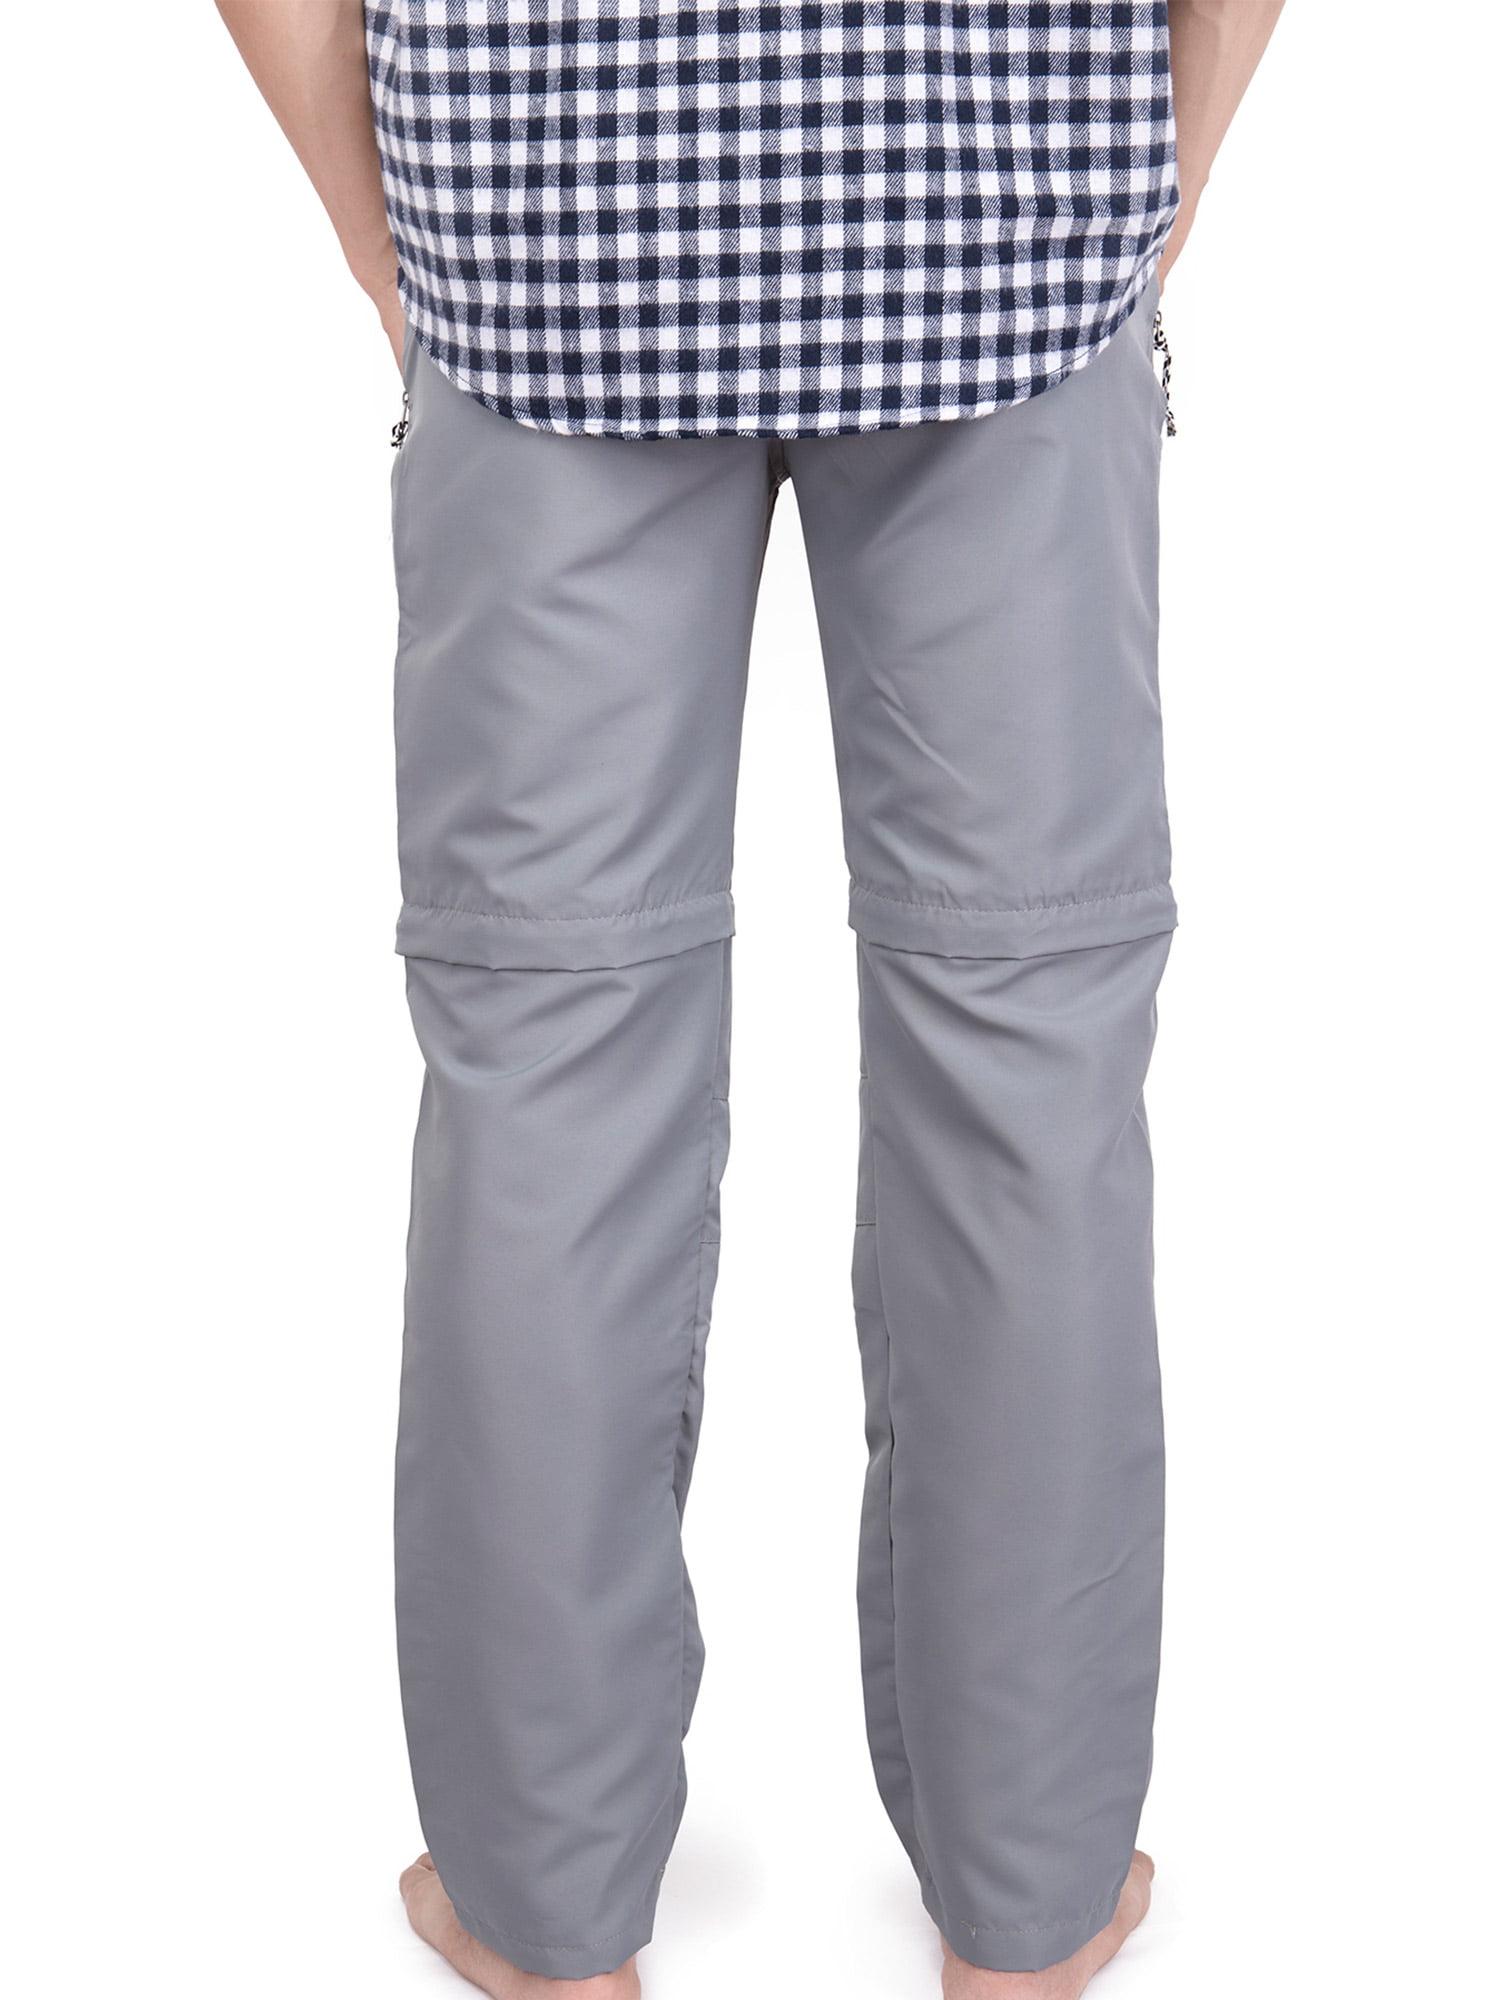 Result Core Mens Outdoor Waterproof Trousers